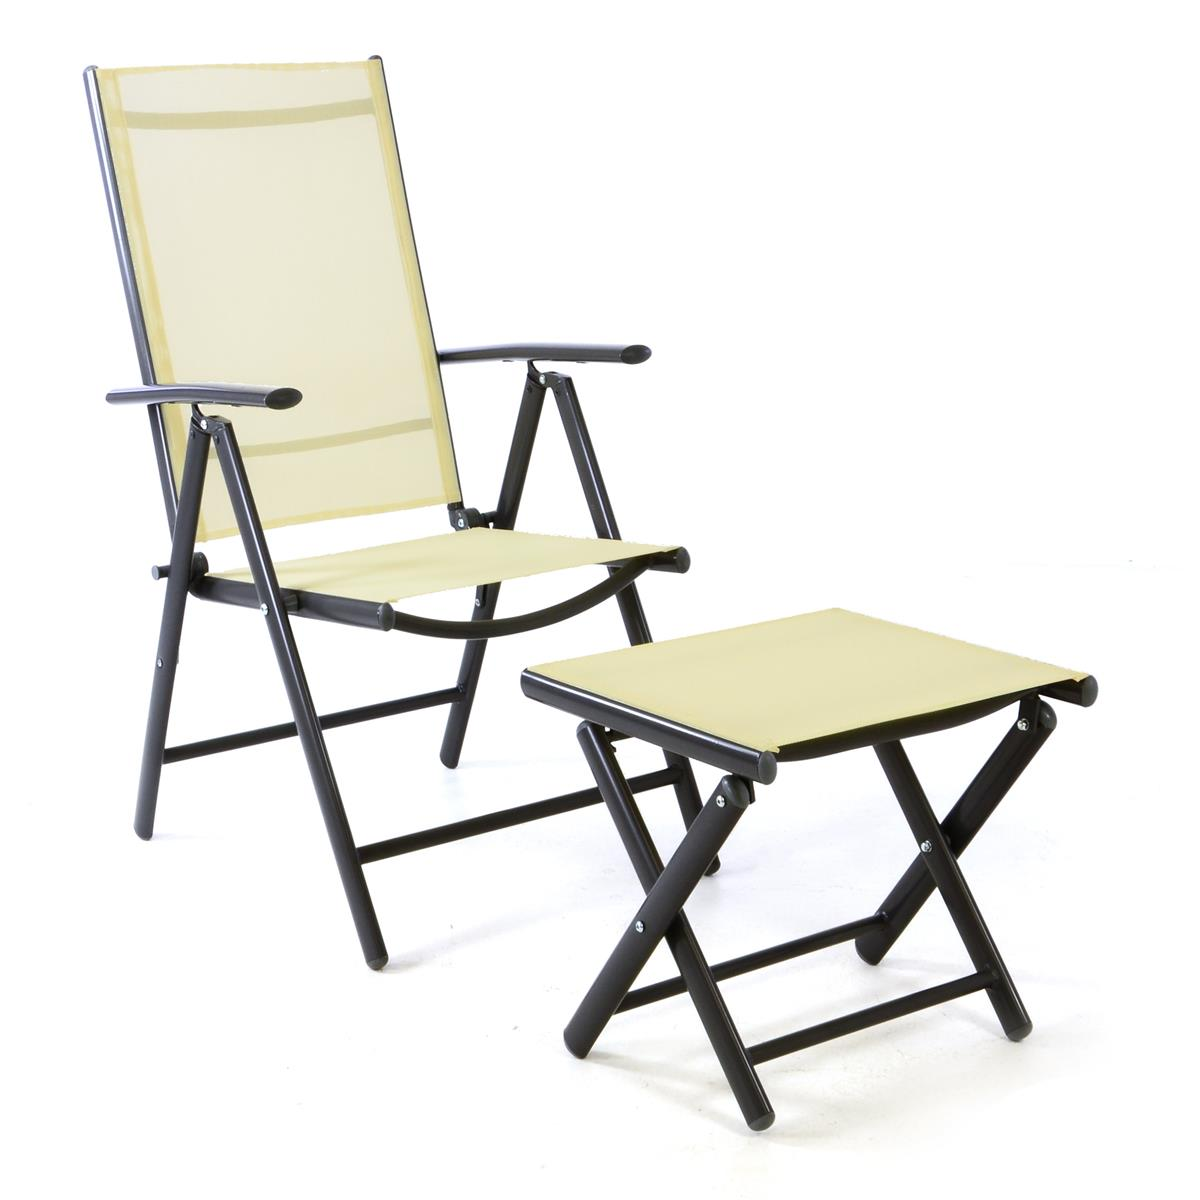 Set Klappstuhl + Hocker Textiline creme Rahmen anthrazit Gartenstuhl Alu Camping